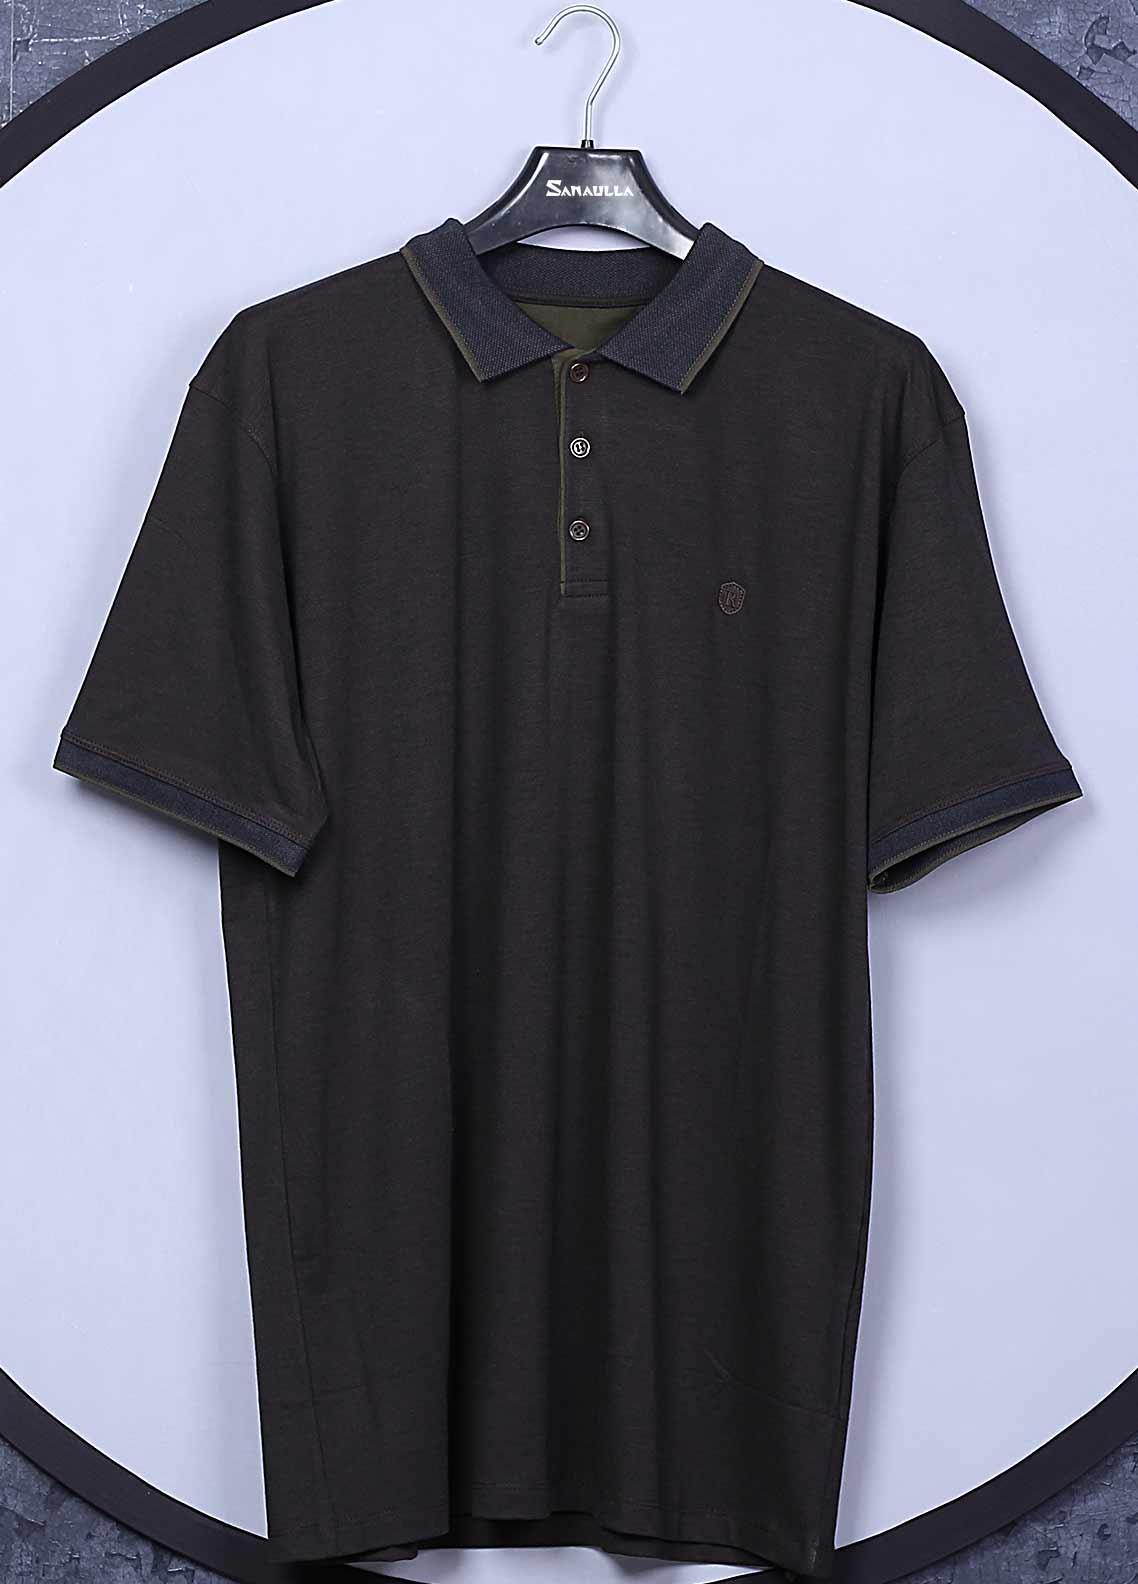 Sanaulla Exclusive Range Cotton Casual T-Shirts for Men -  5570 Dark Grey